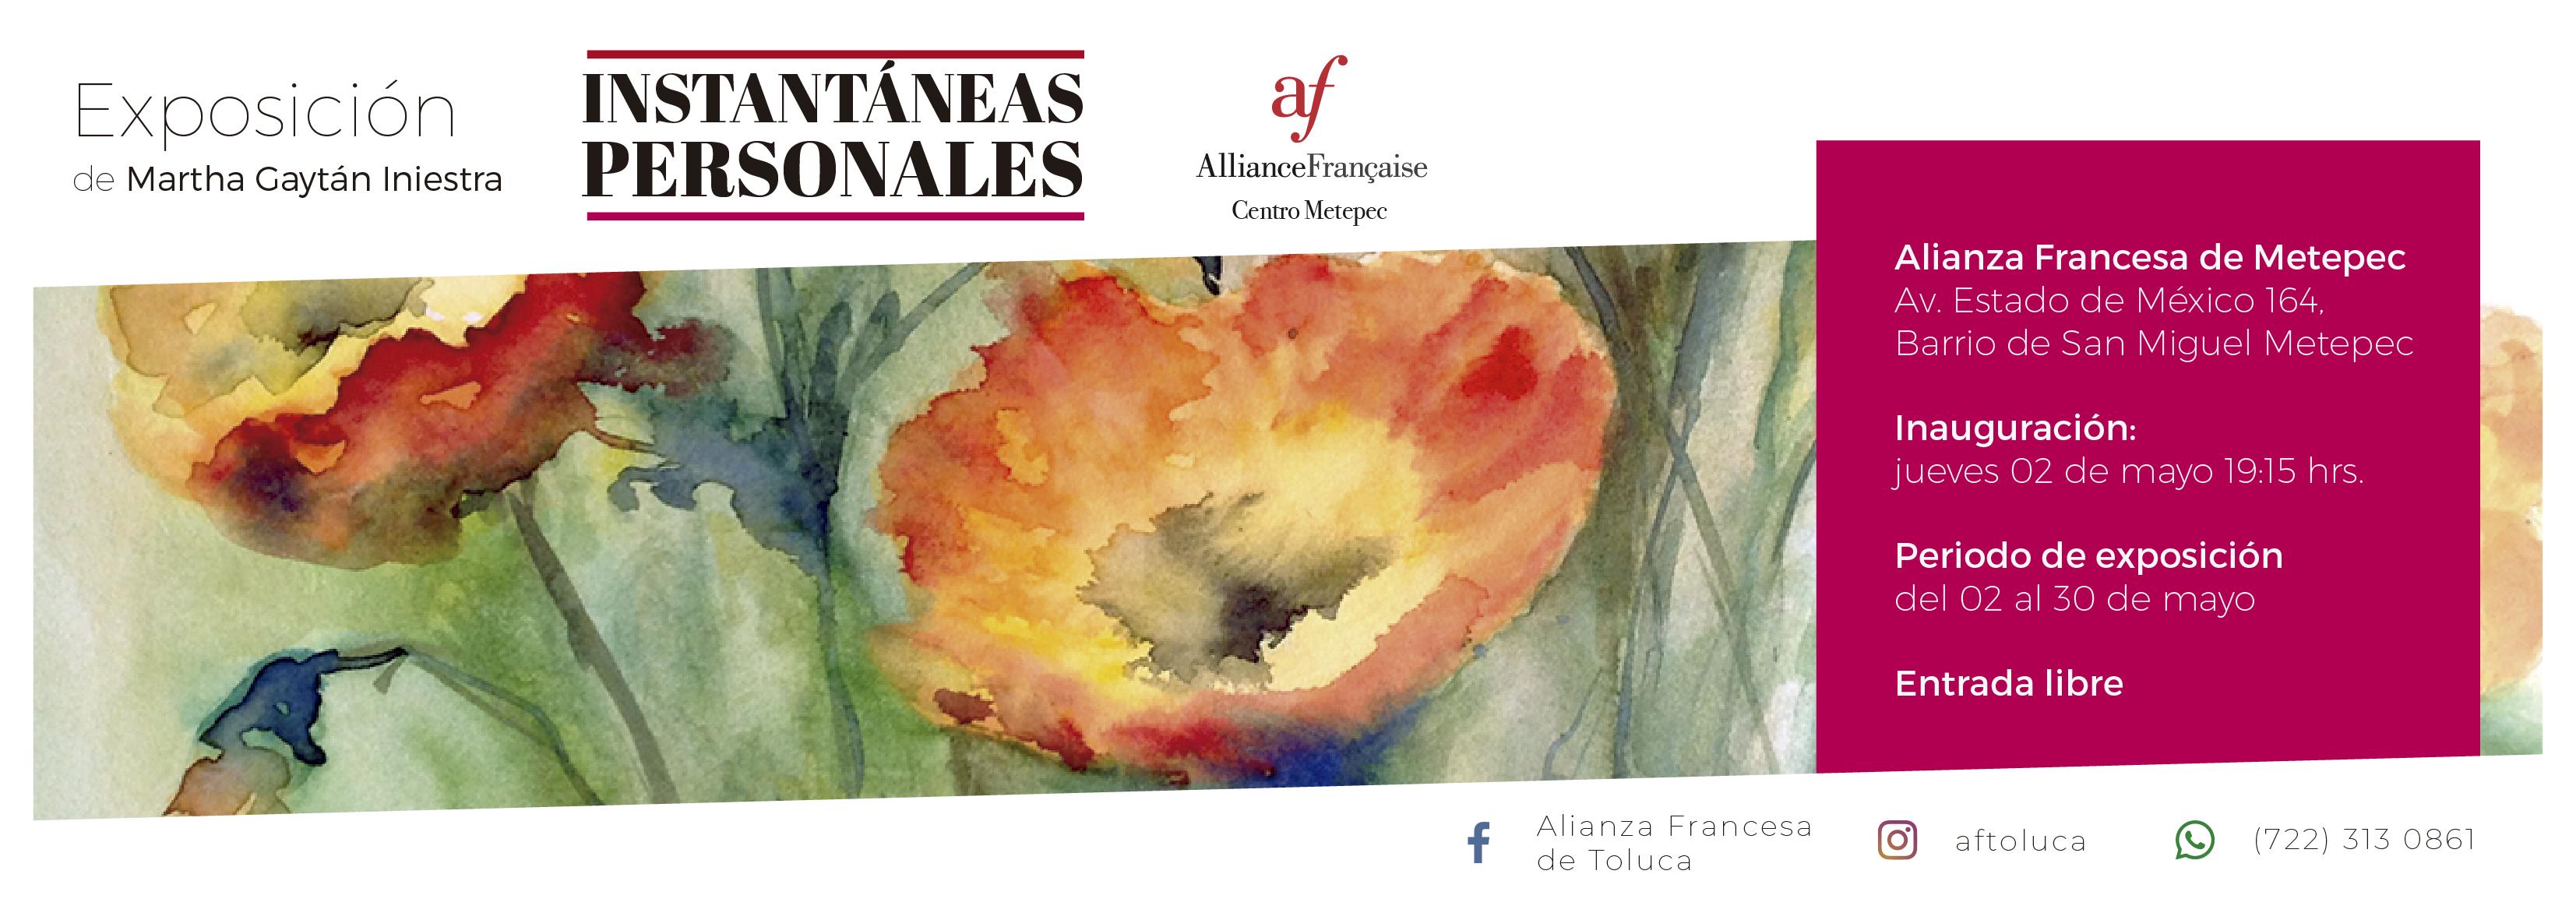 Convocatoria Artes visuales 2019